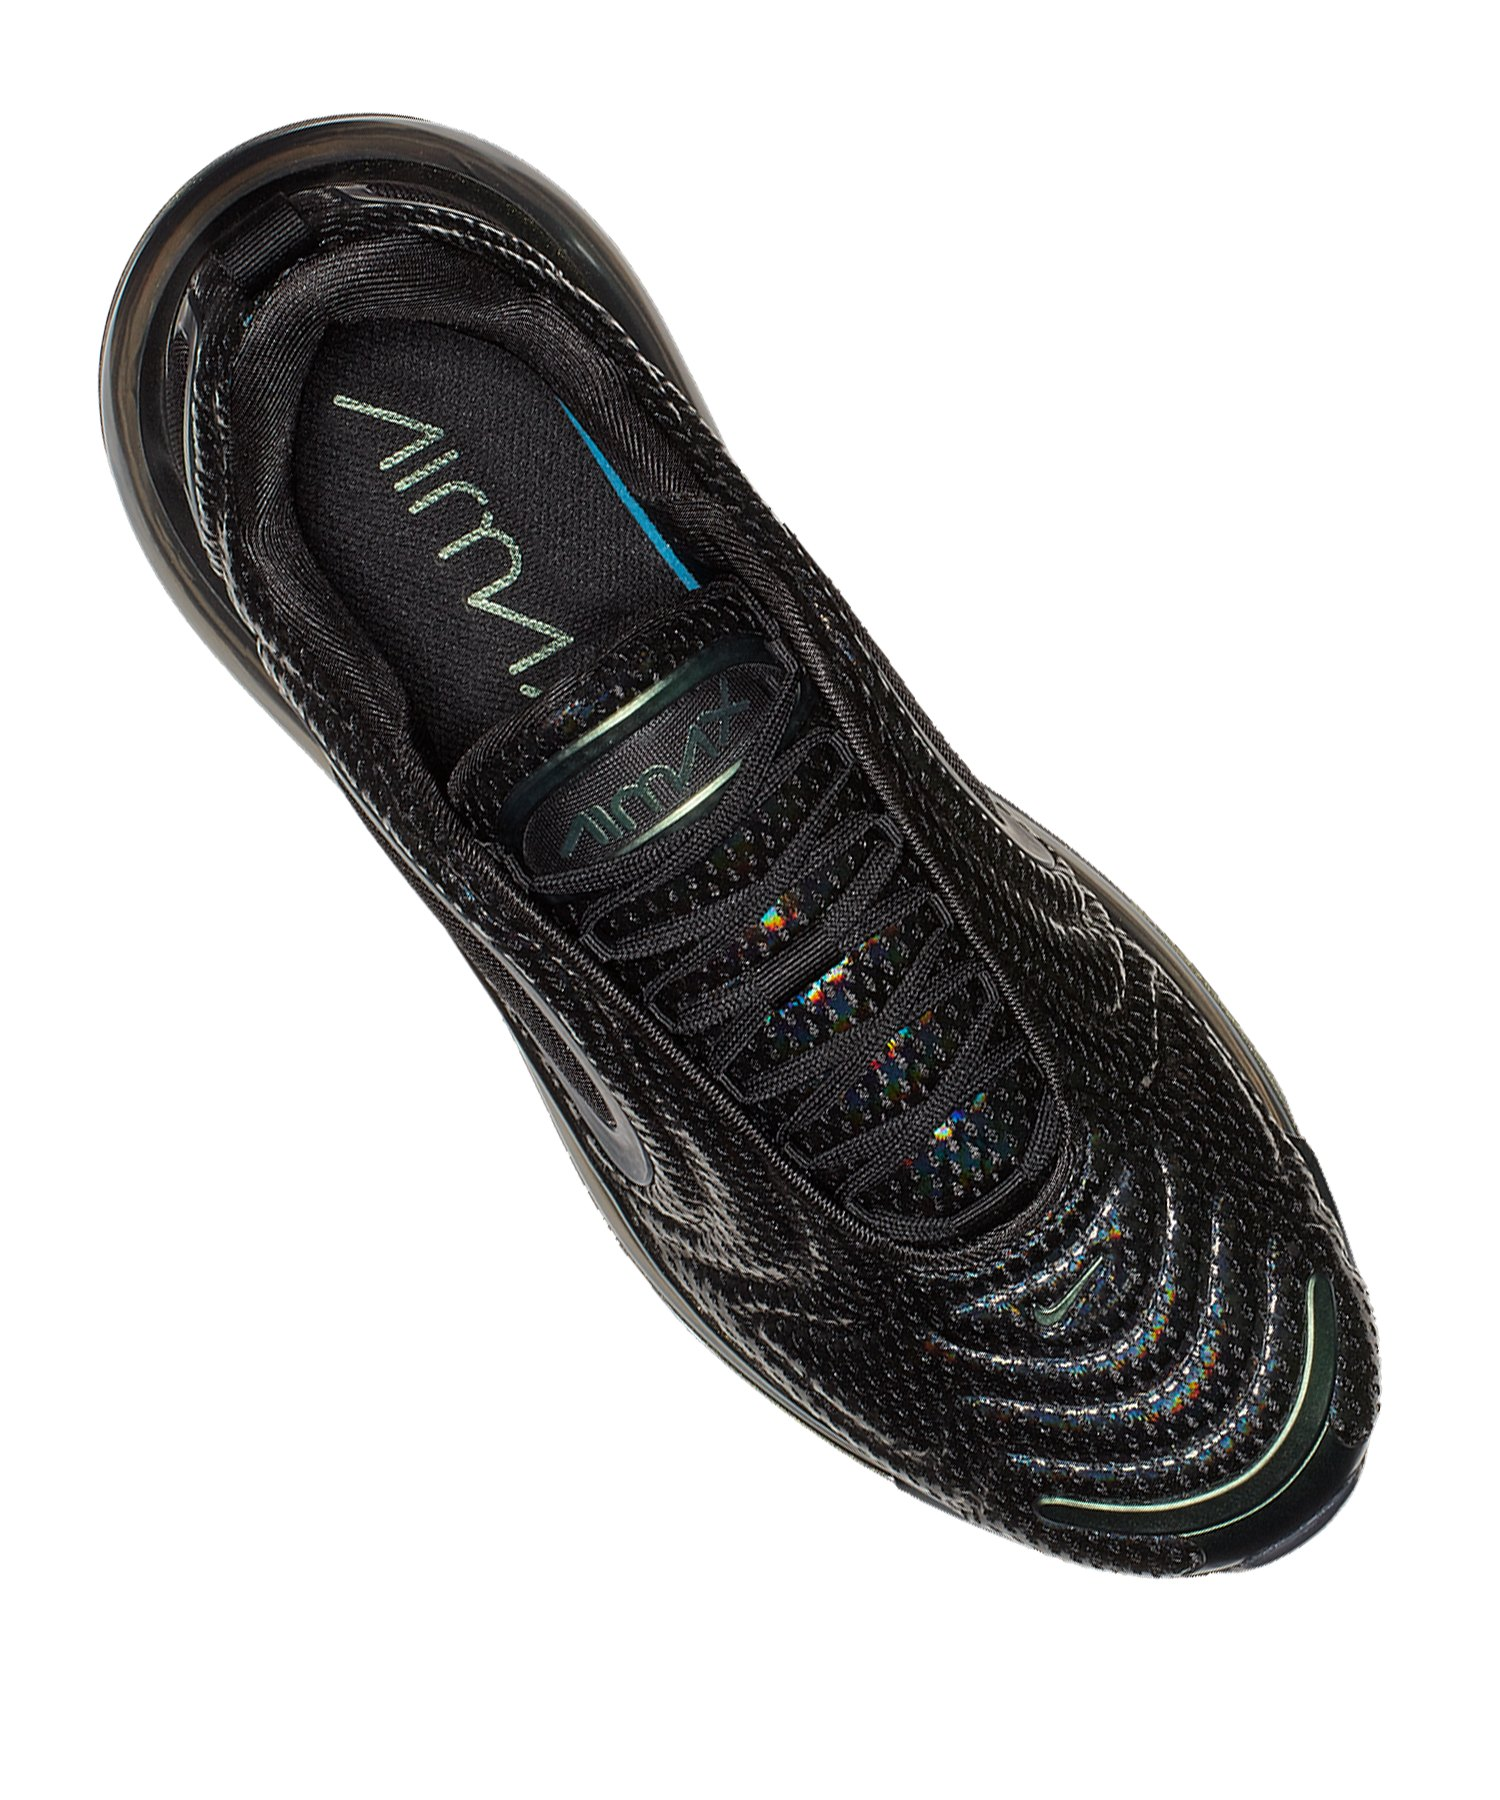 new style 4fe15 6fa62 ... Nike Air Max 720 Sneaker Schwarz Silber F003 - schwarz ...